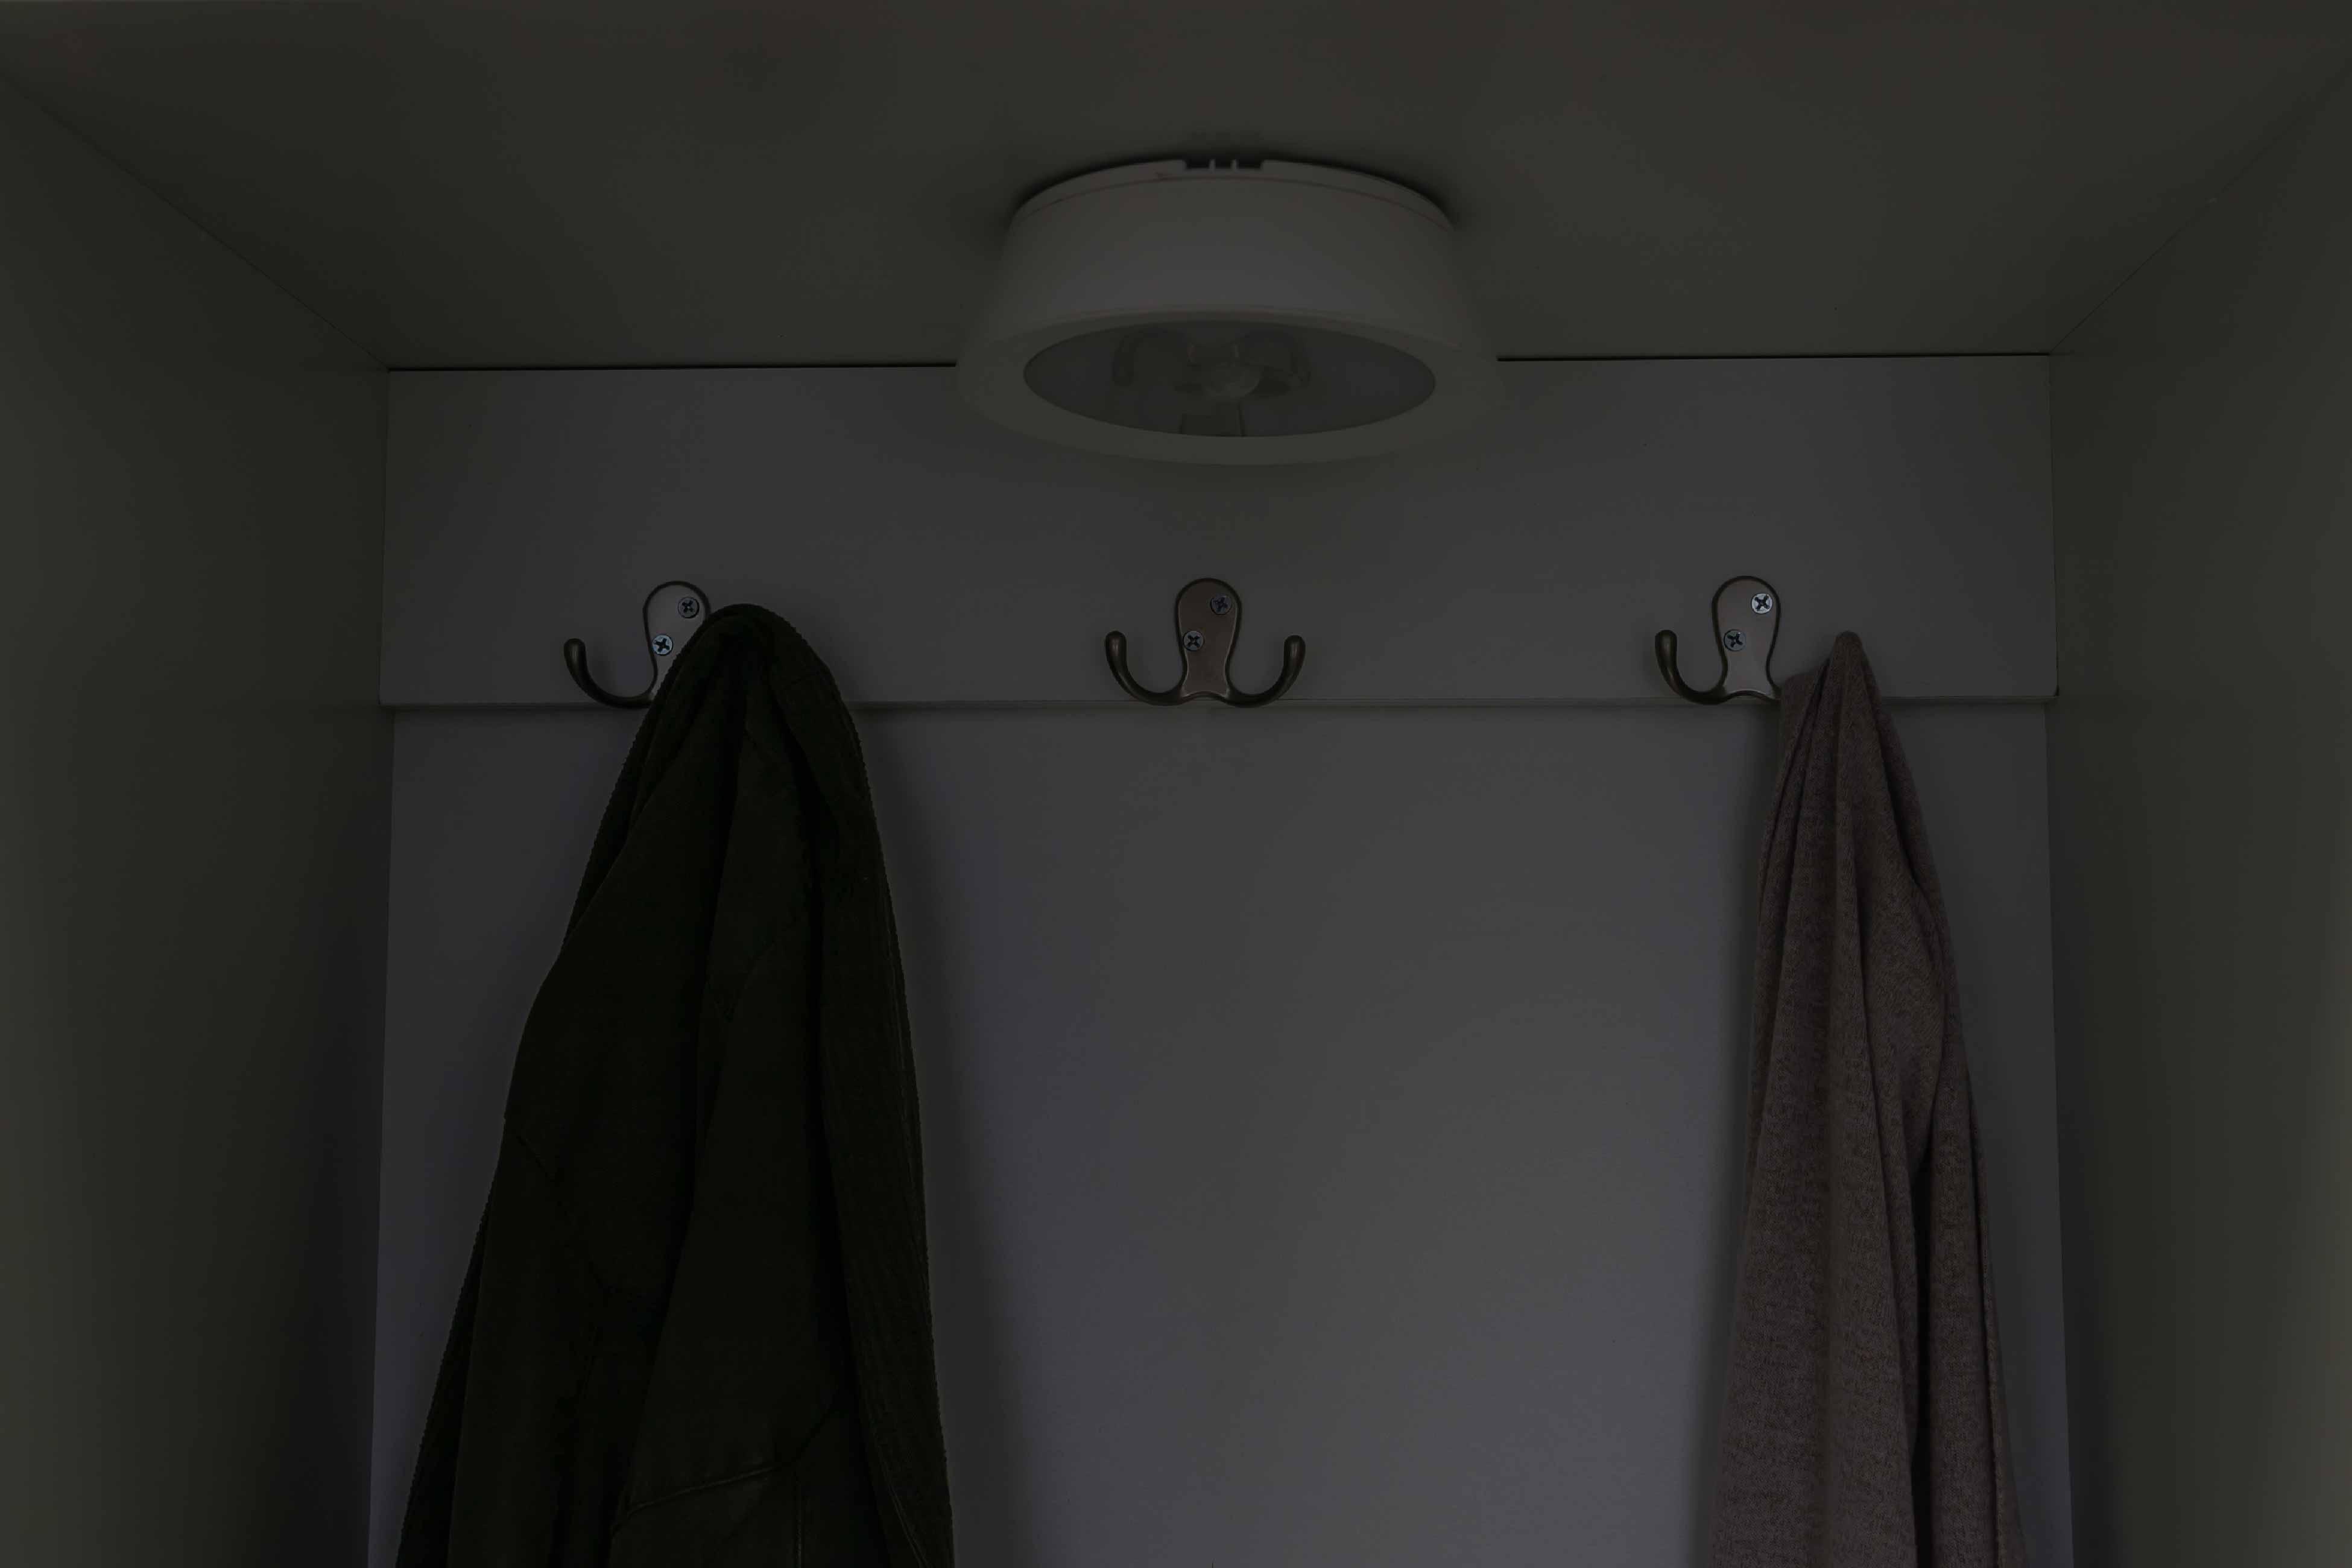 Wireless Led Ceiling Lights Brightness Comparison